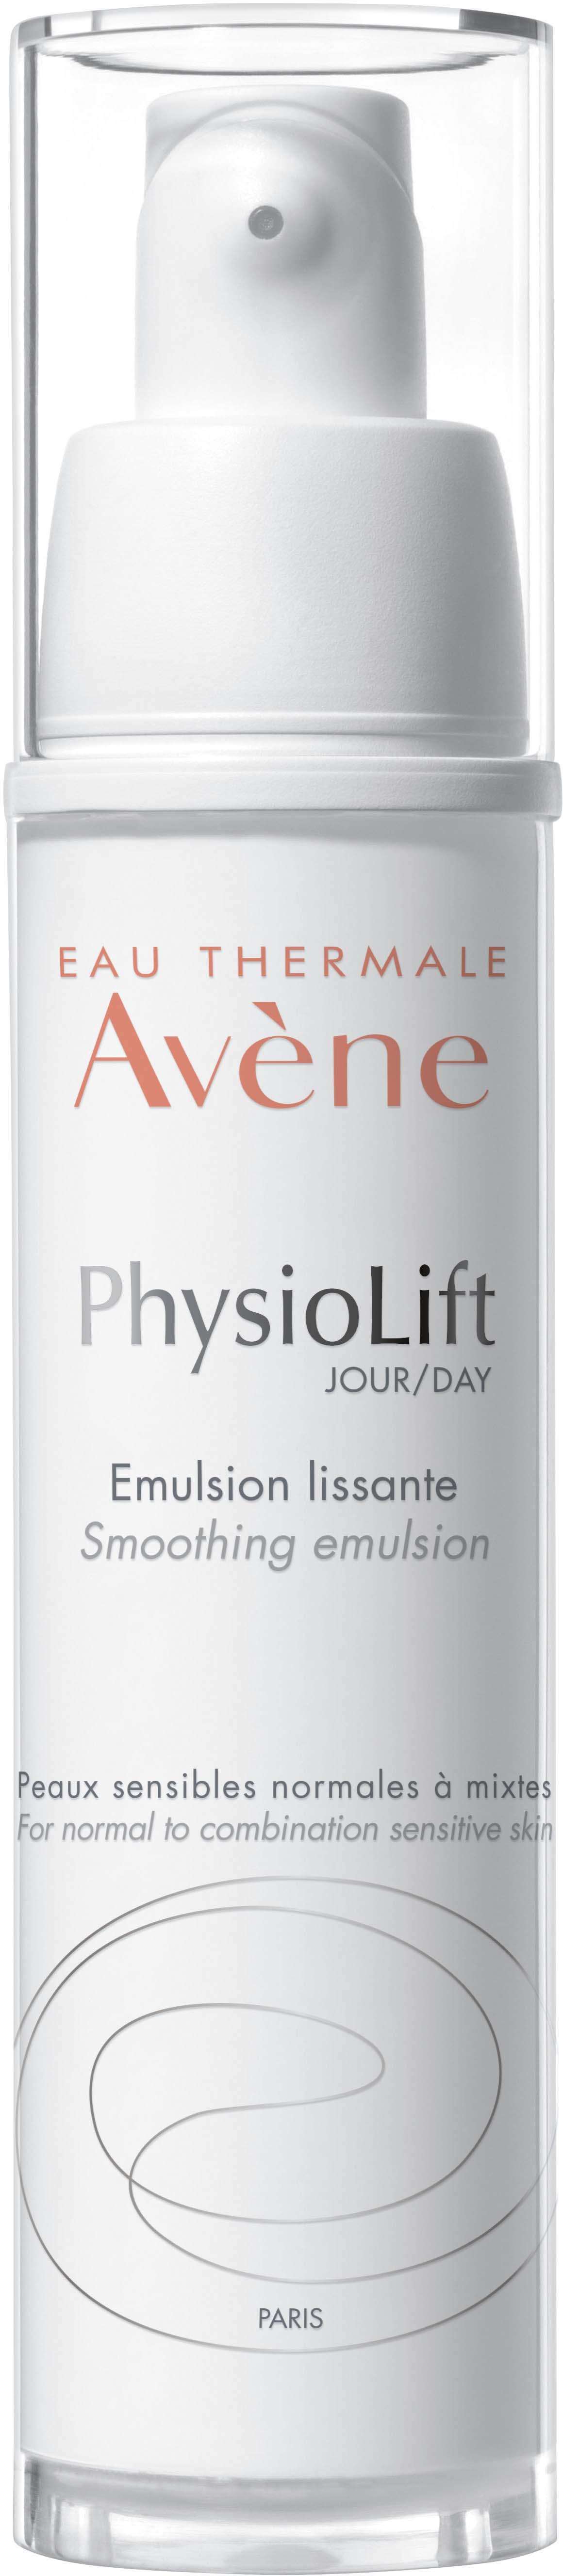 Physiolift эмульсия дневная разглаживающая от глубоких морщин 30мл Avene (Авен)